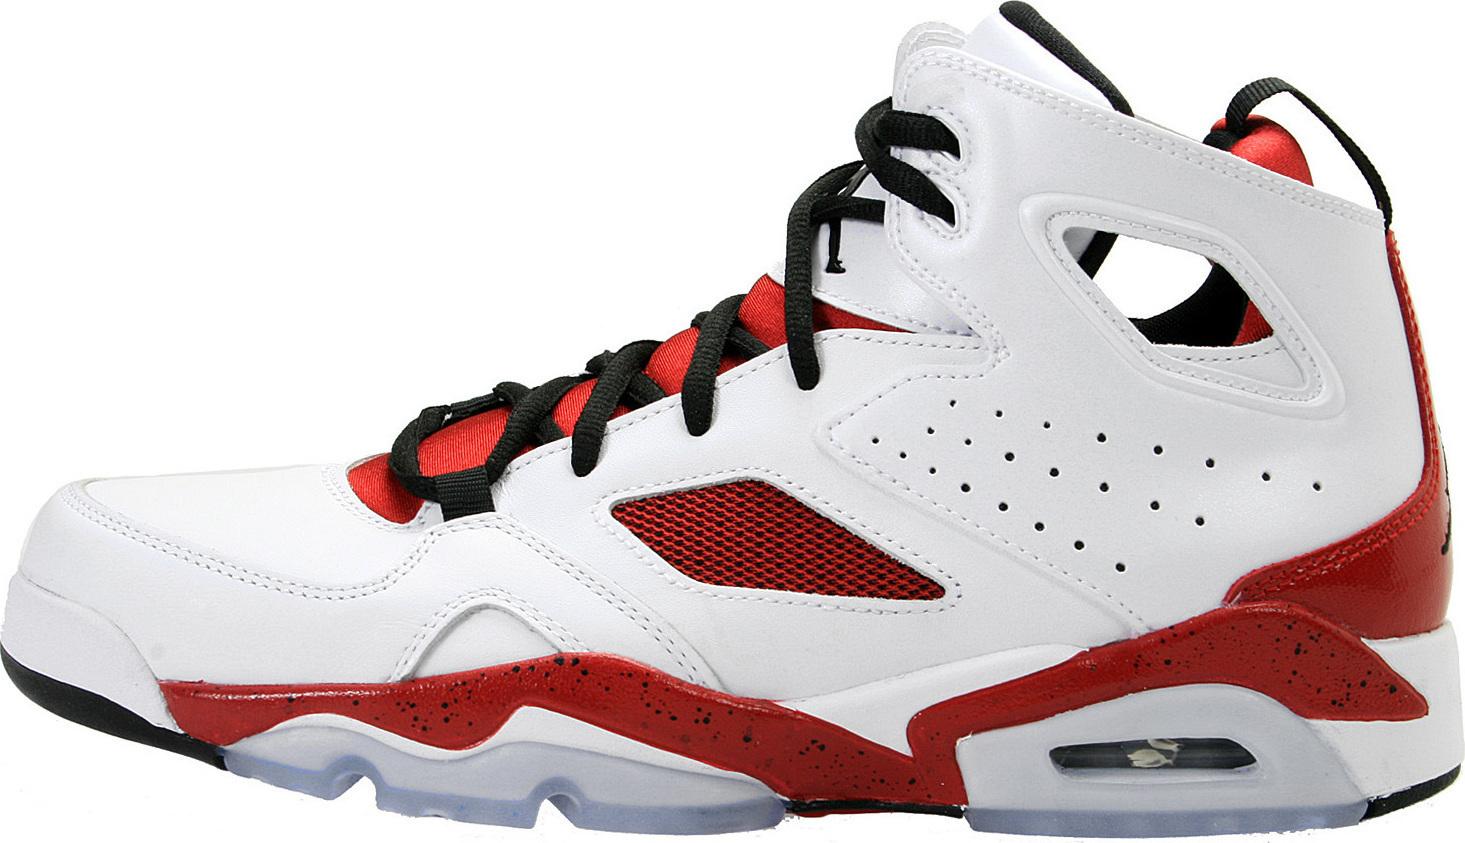 brand new 46ba4 5d60a Προσθήκη στα αγαπημένα menu Nike Air Jordan Flight Club 91 555475-101